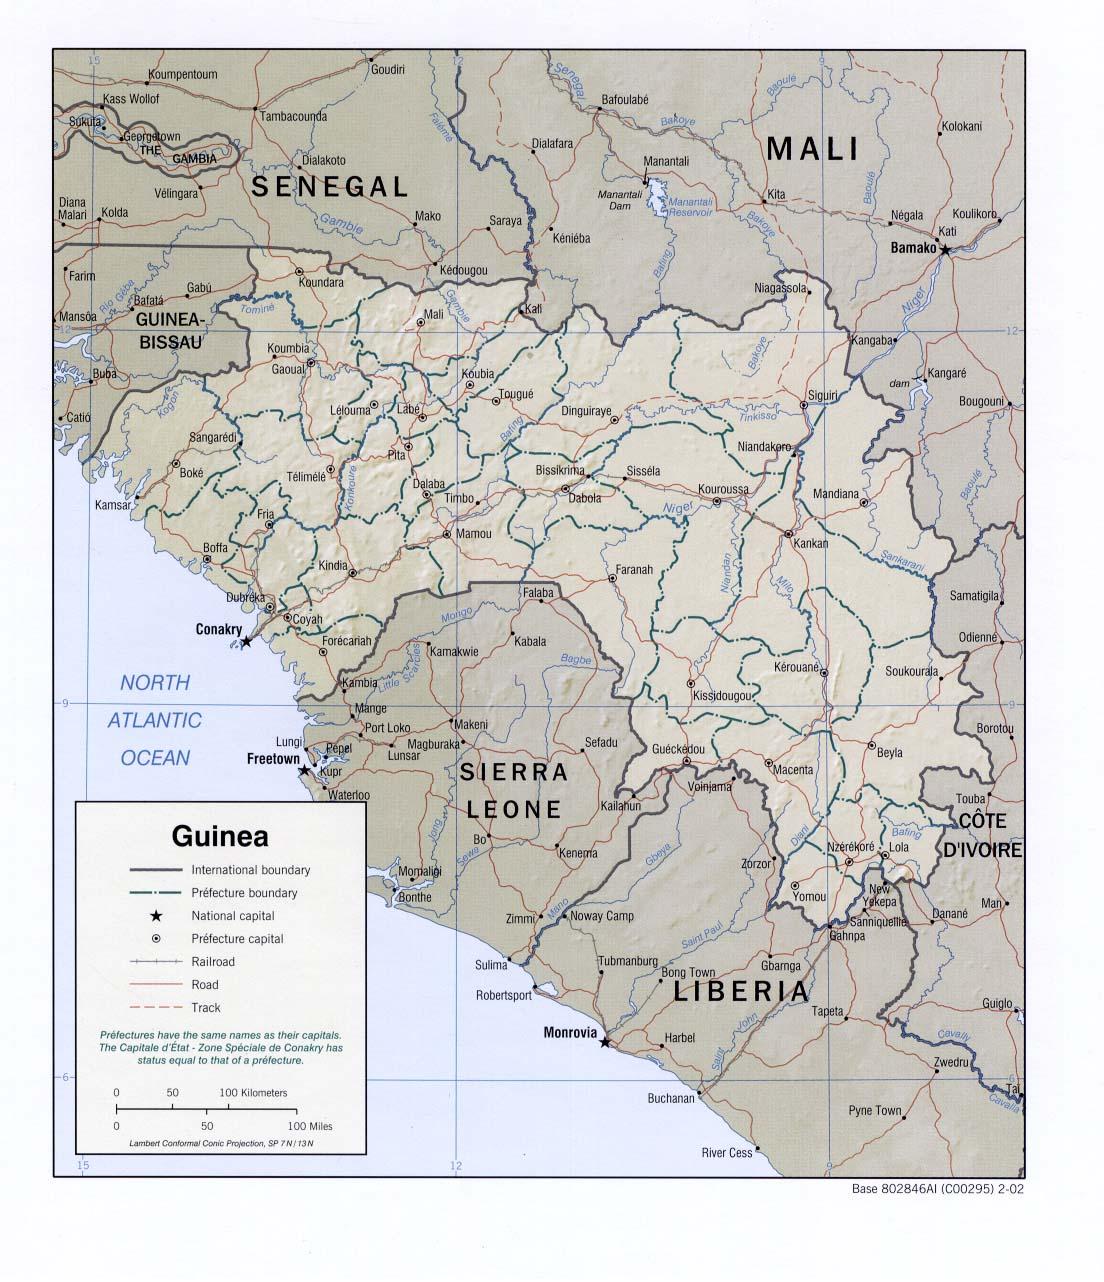 Mapa de Relieve Sombreado de Guinea